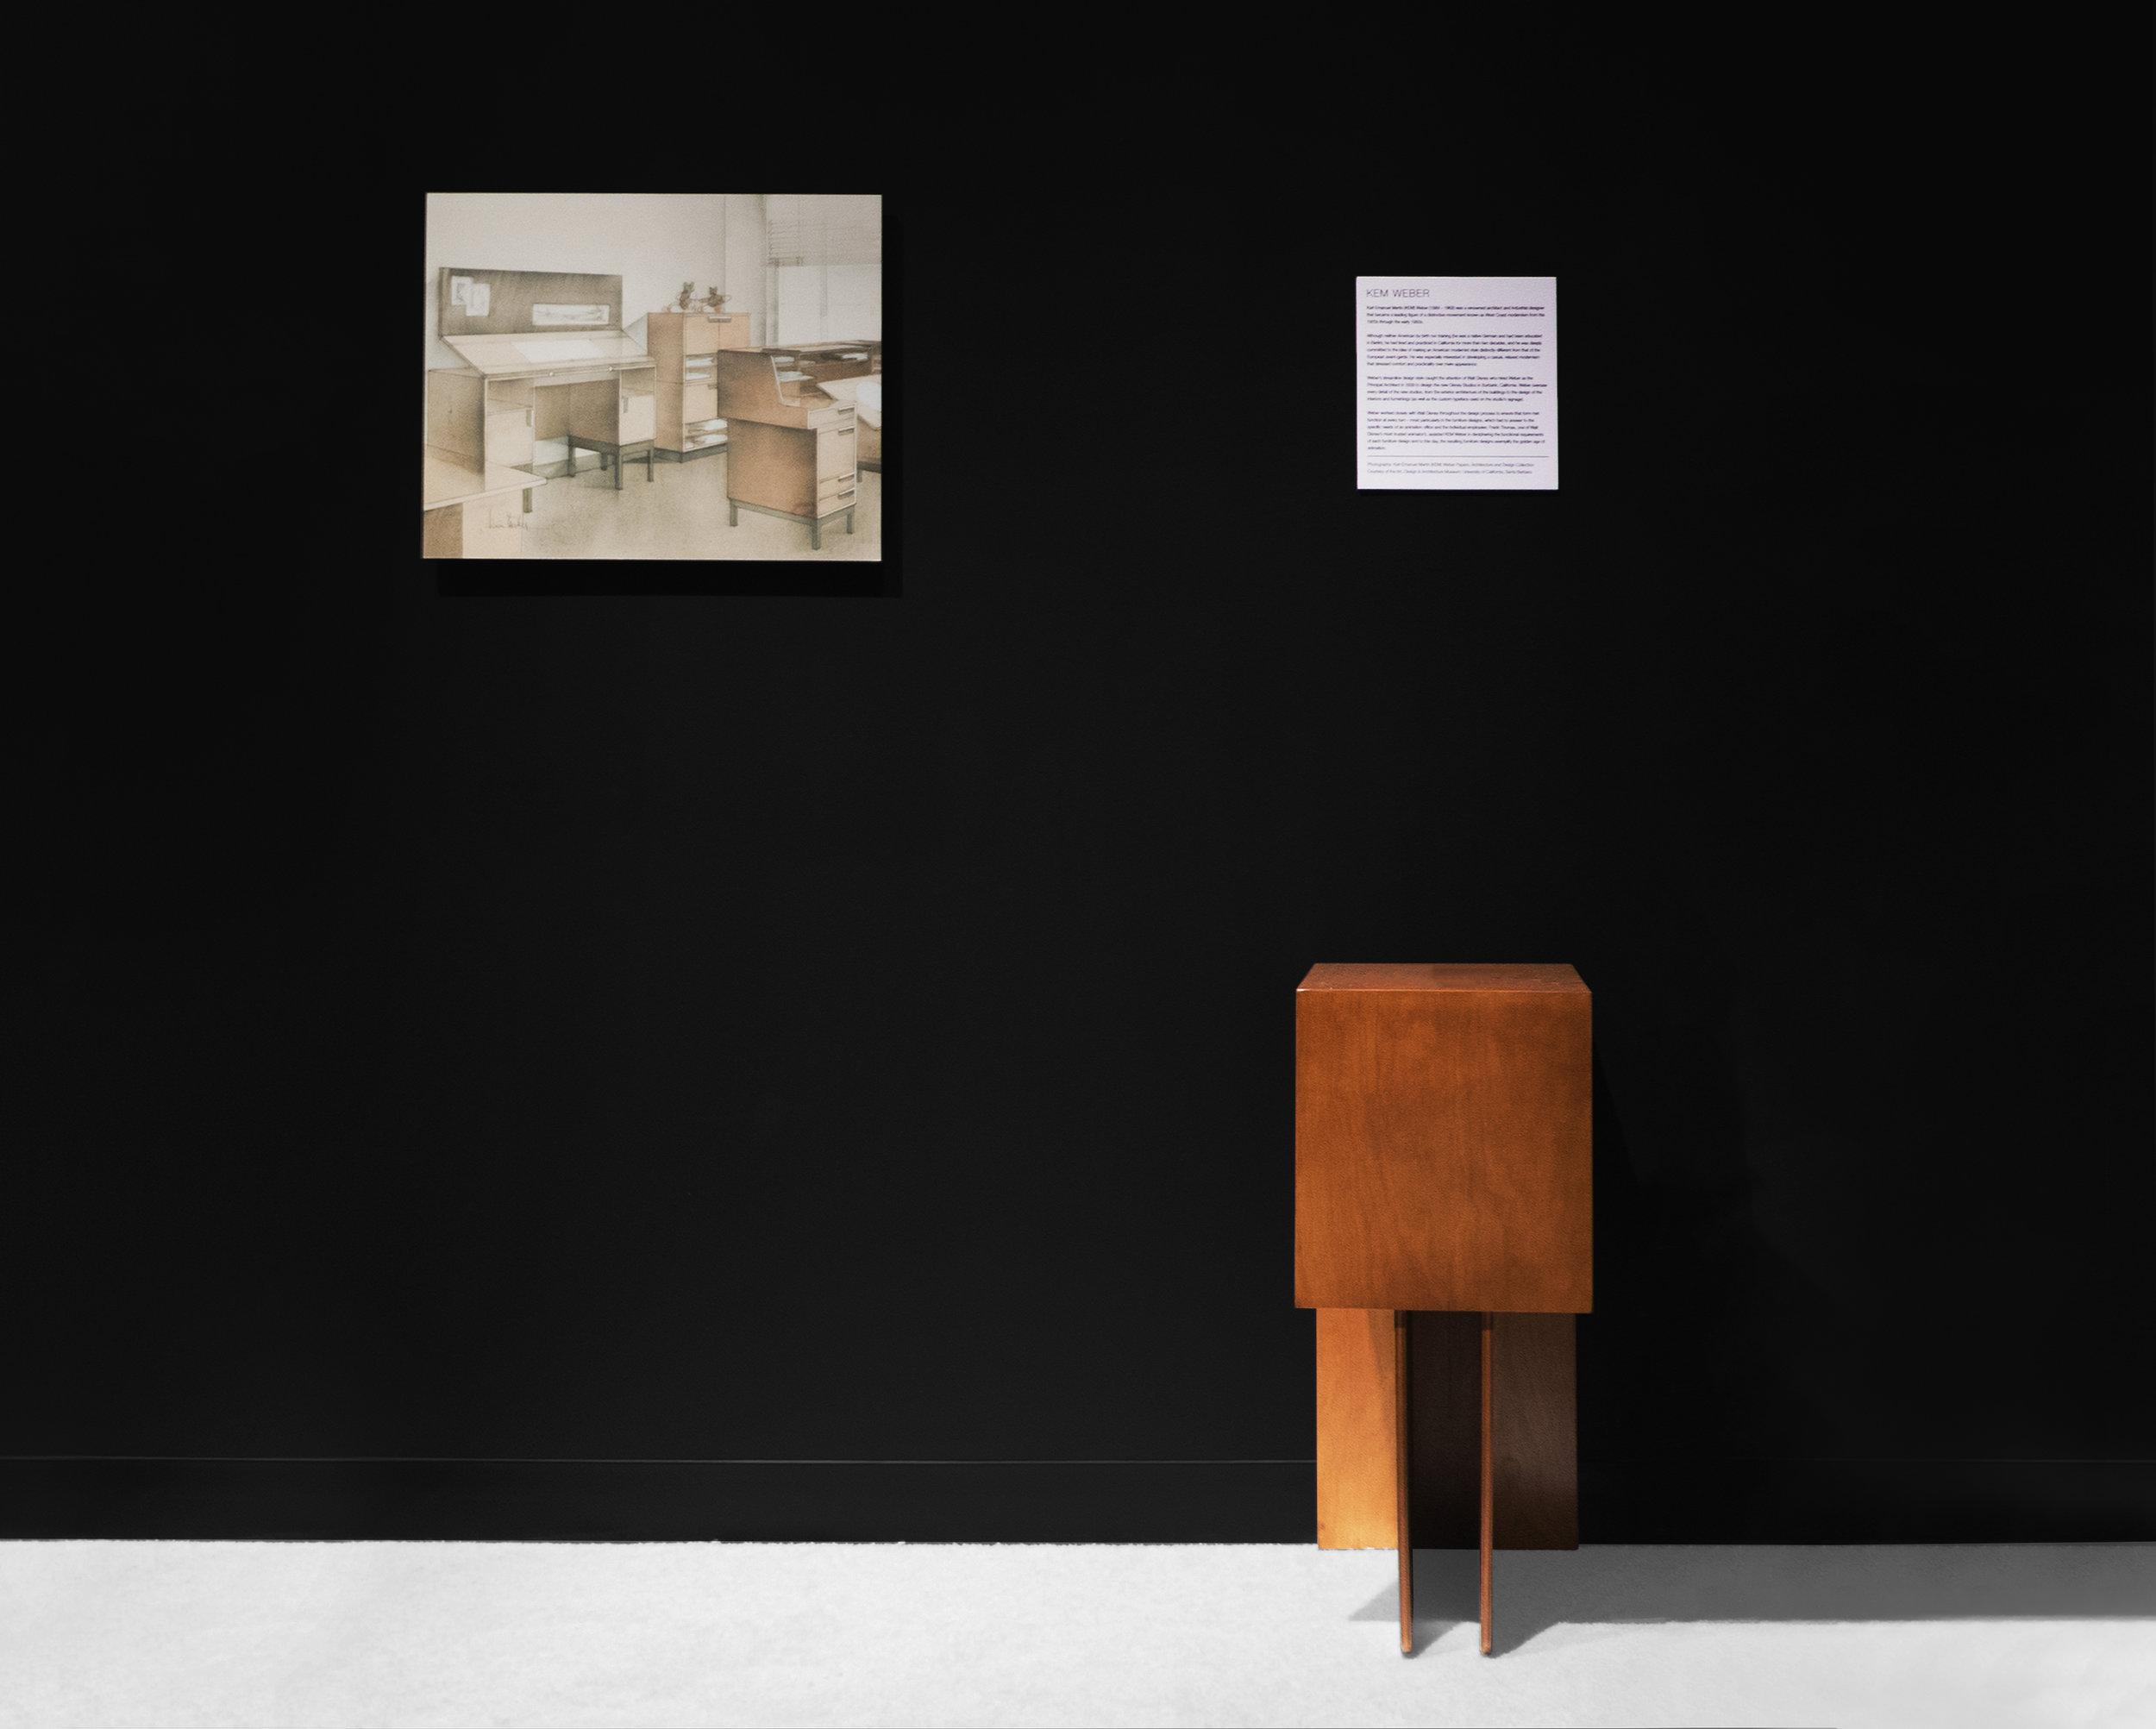 Design Miami 2018_Peter Blake Gallery_Installation View_11.jpg